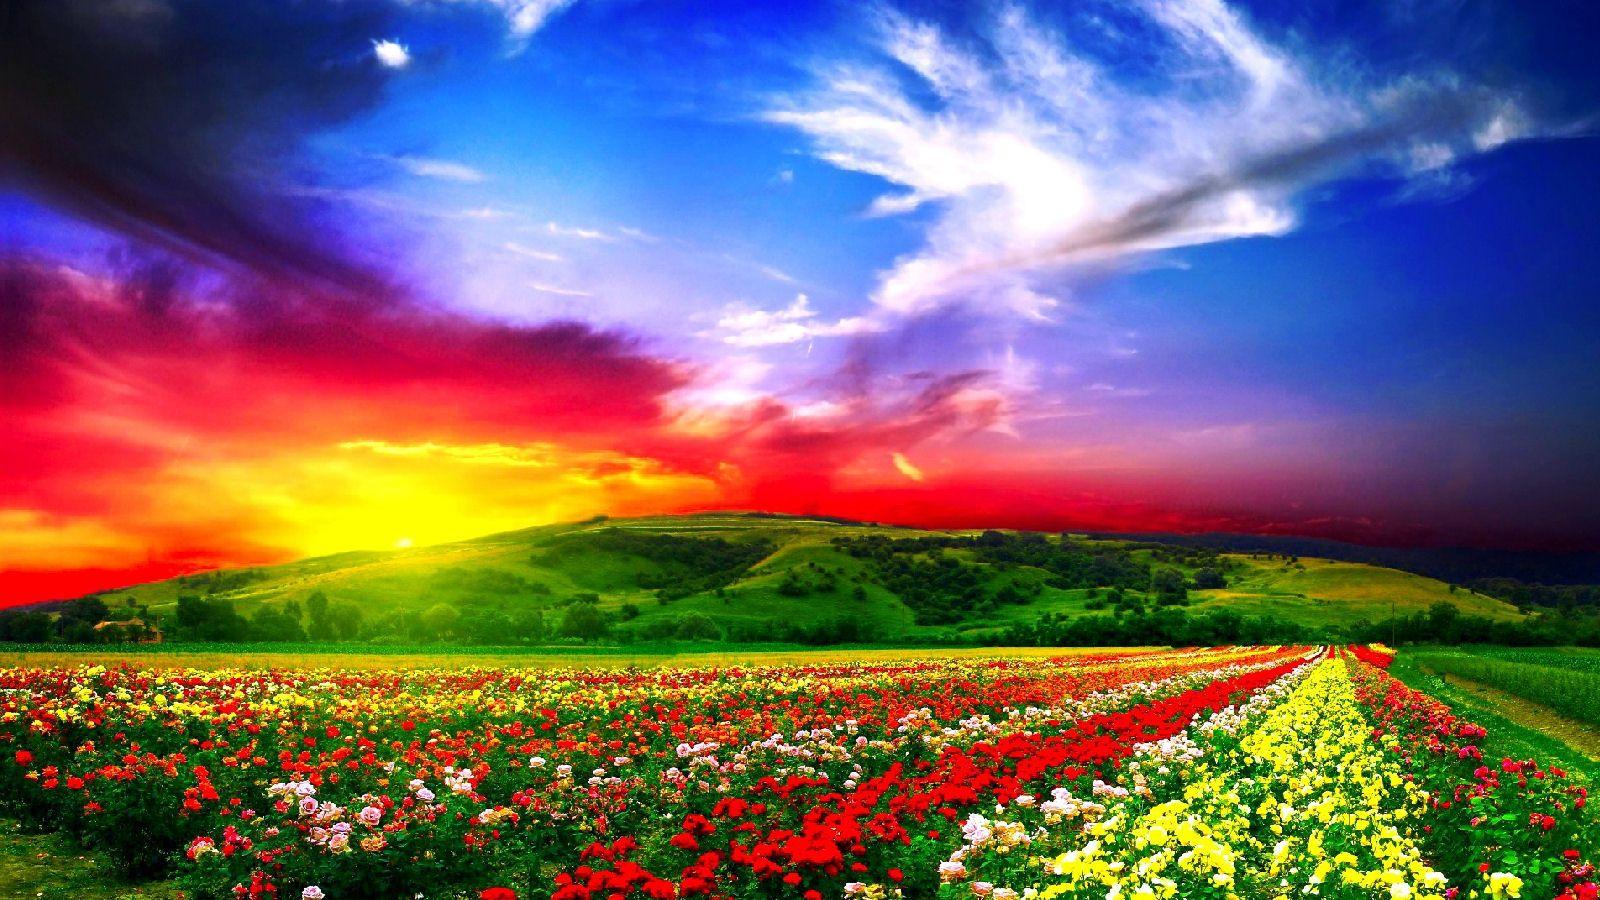 Flower Field Wallpapers, 43 Flower Field 2016 Wallpaper'-s Archive ...